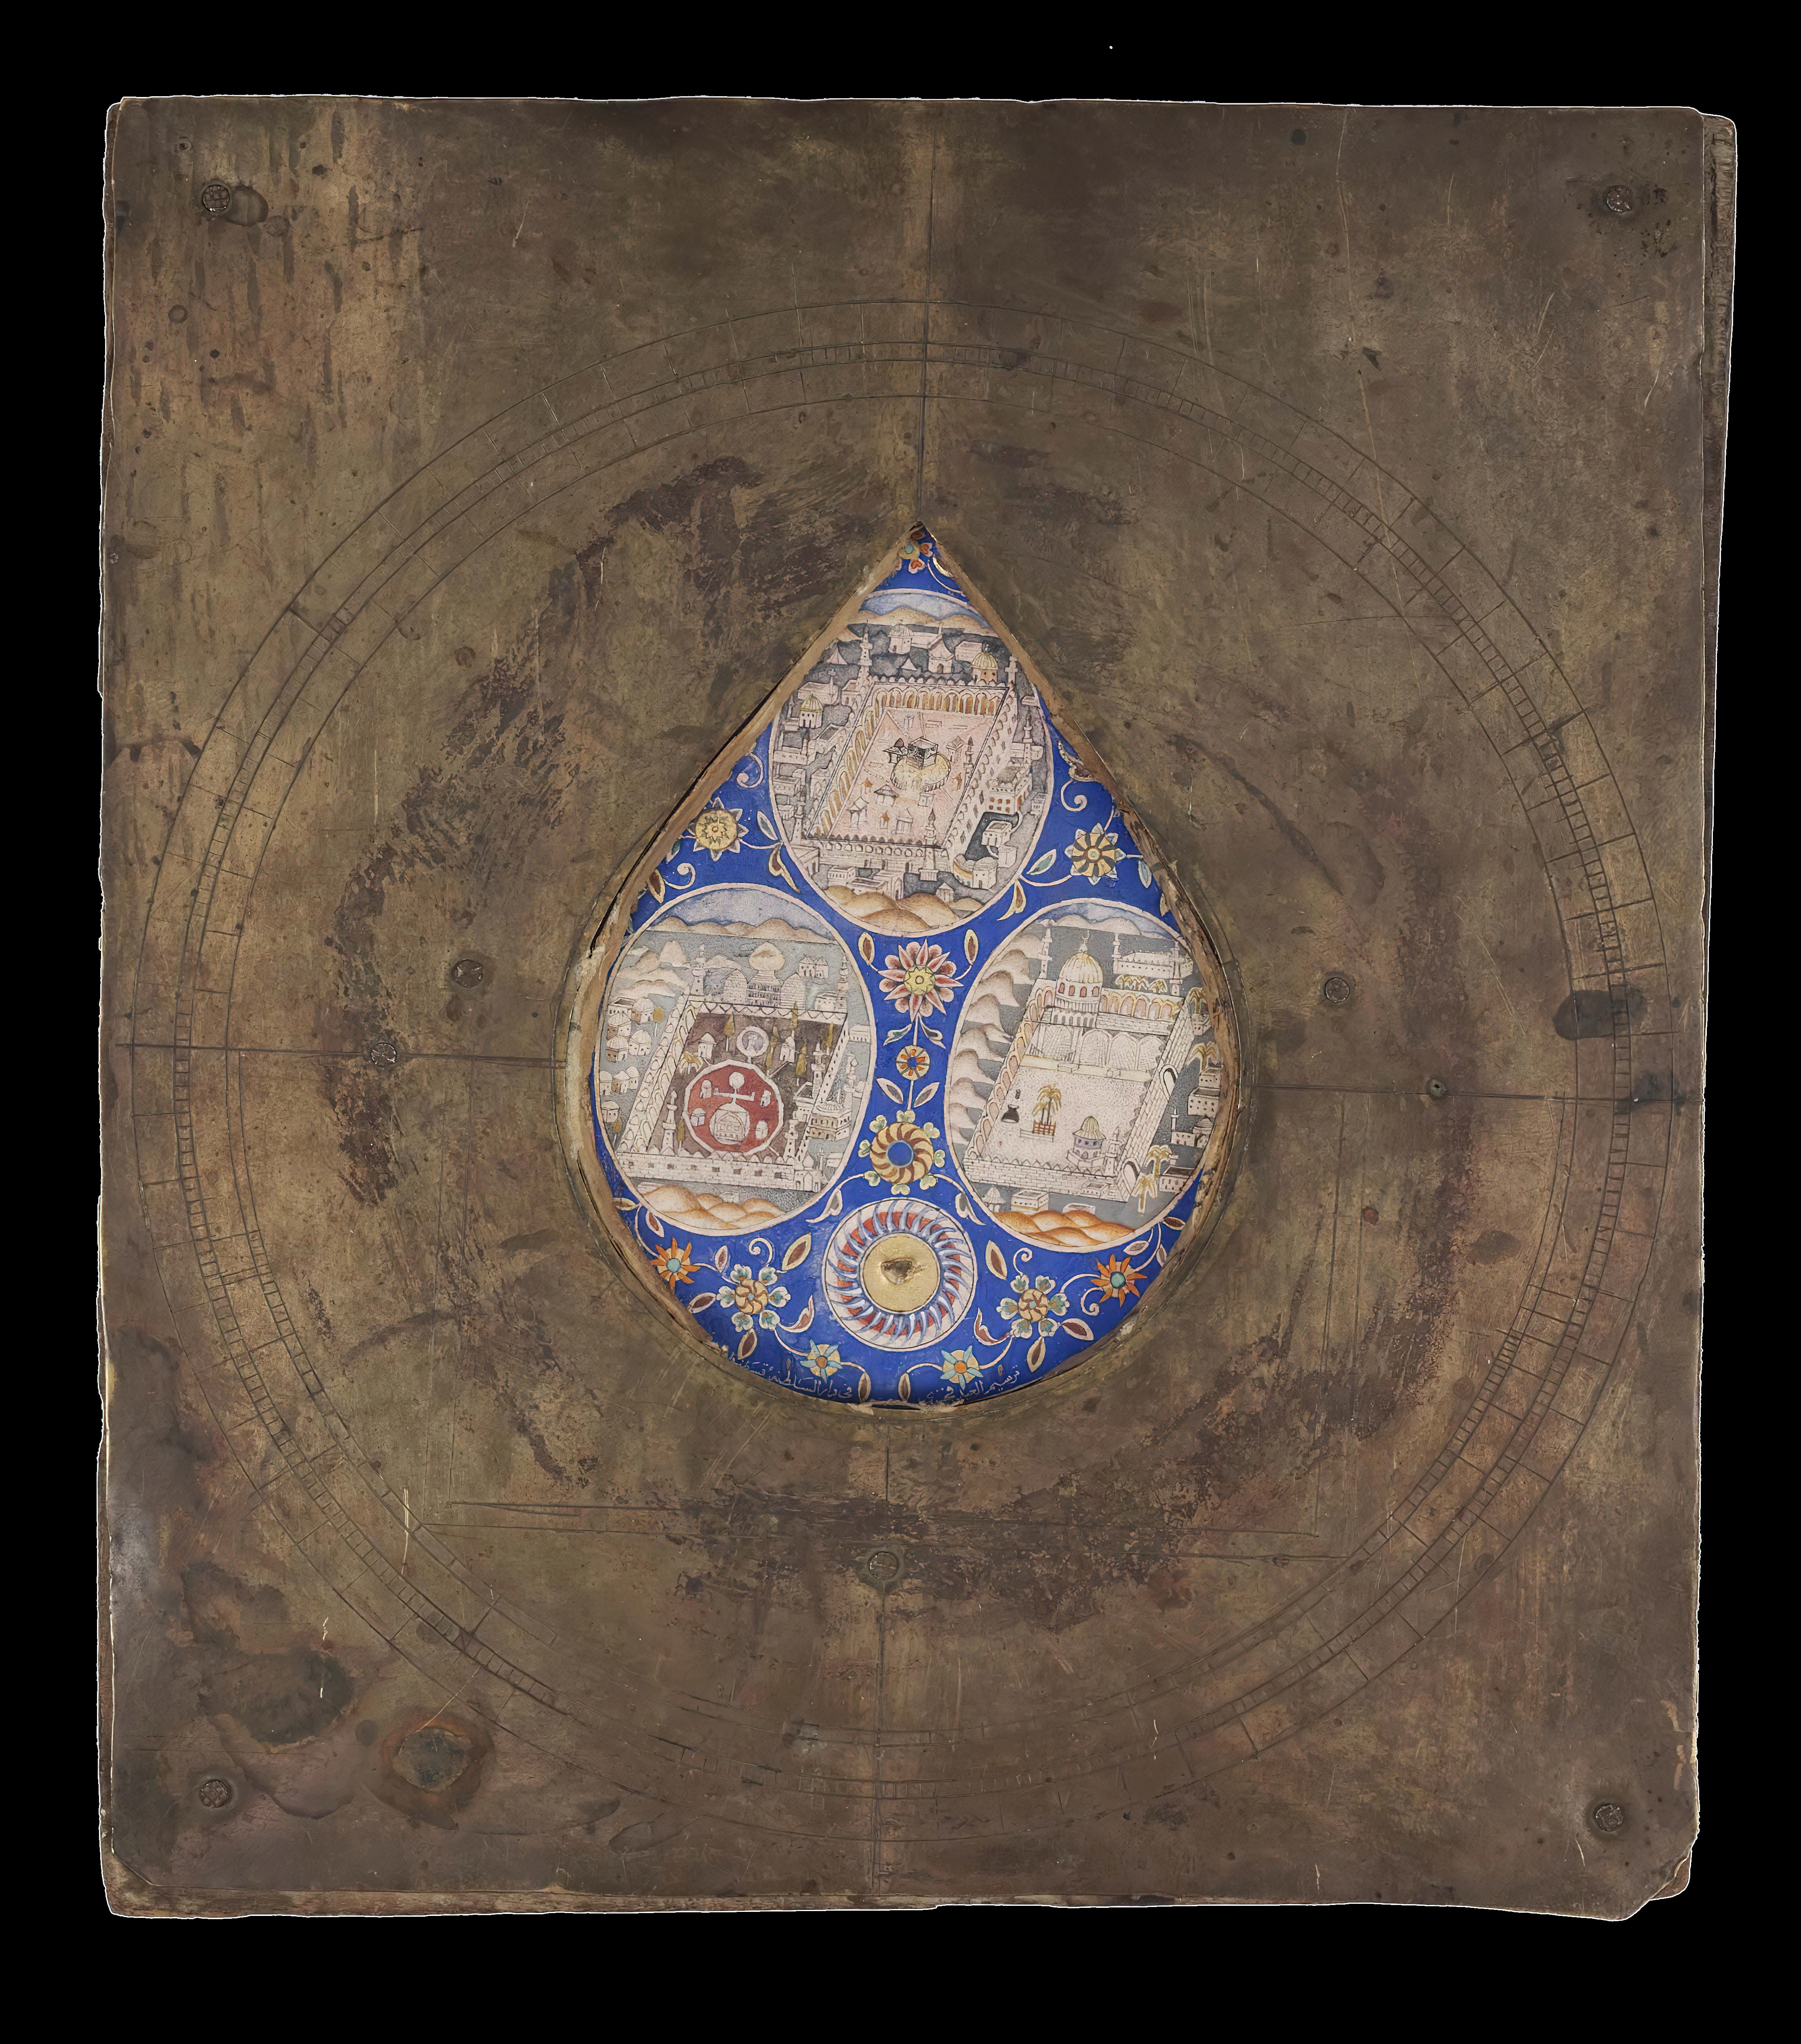 Qiblah compass with views of Mecca, Medina and Jerusalem